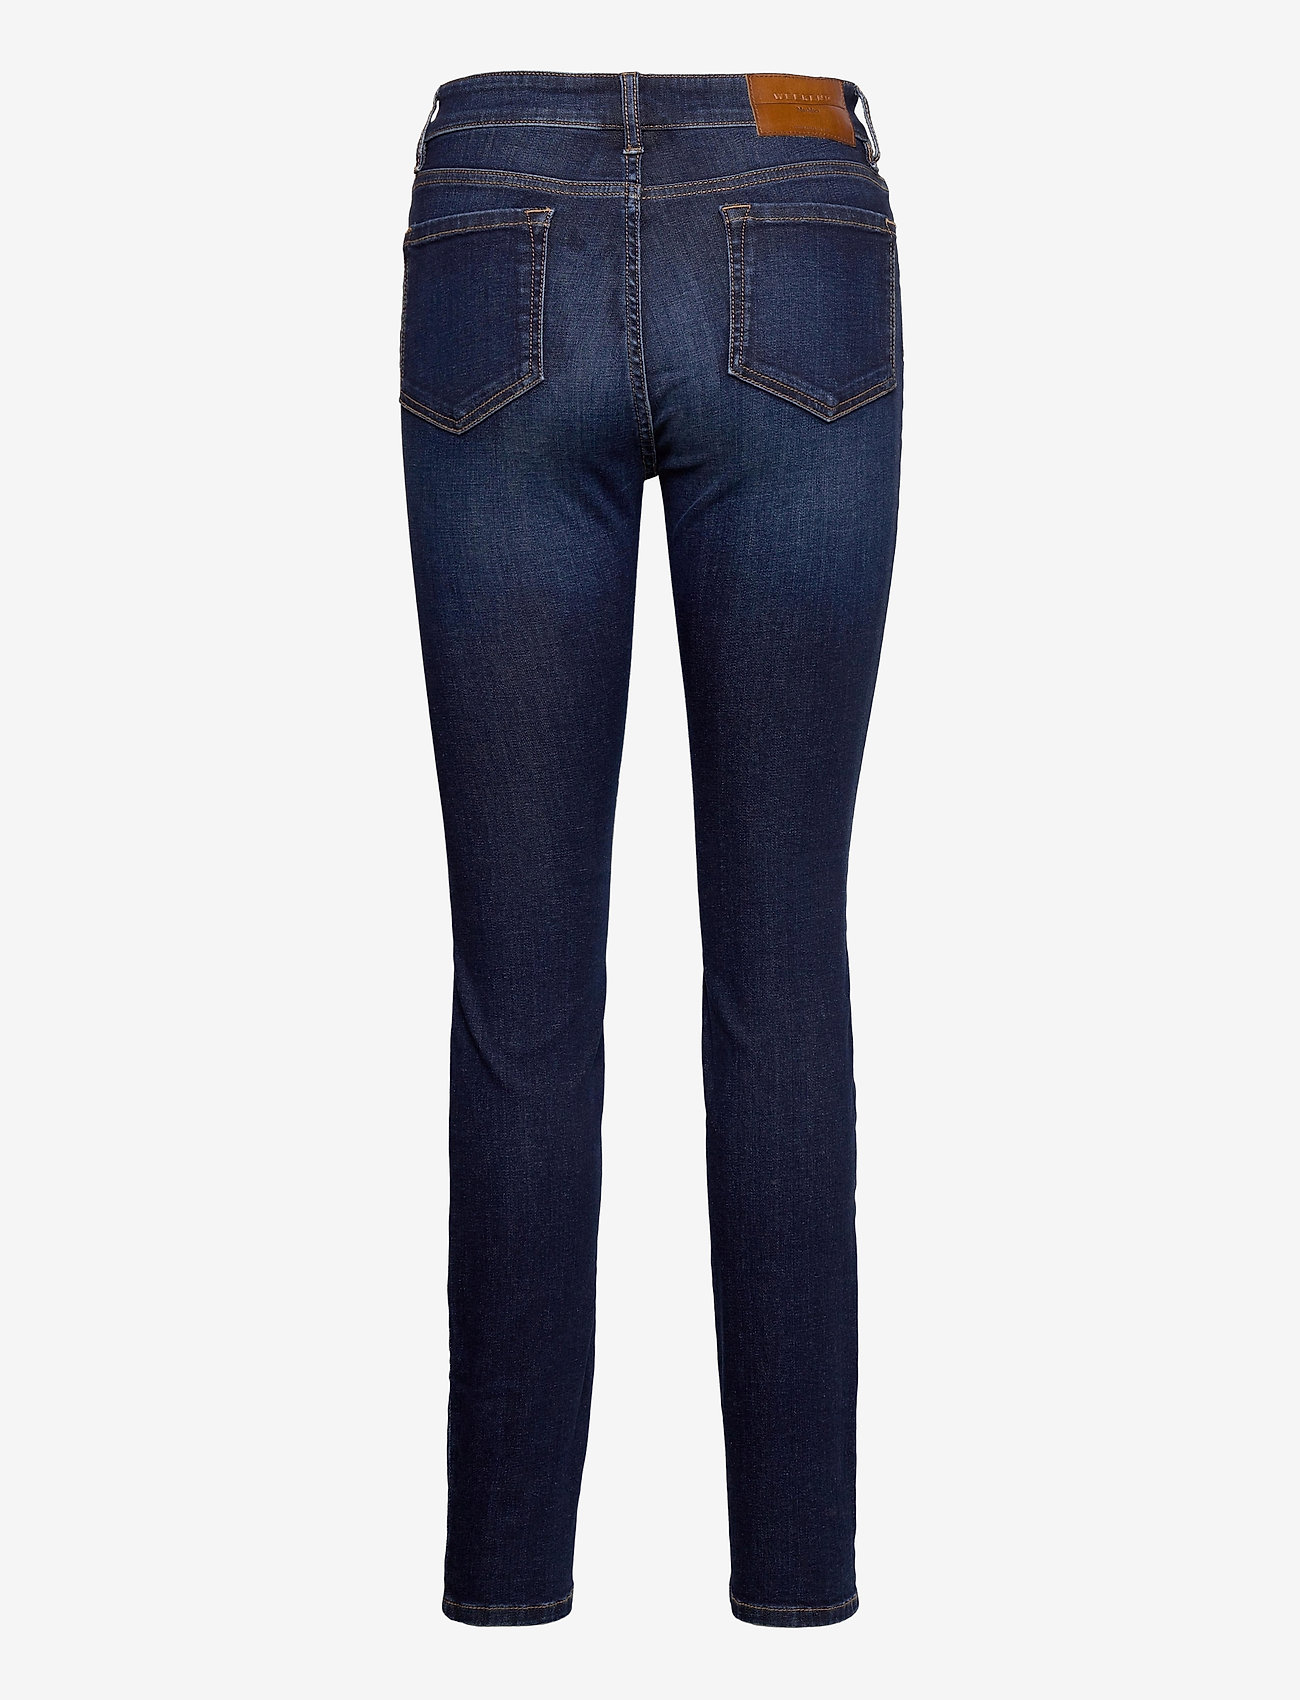 Weekend Max Mara - PATTO - slim jeans - midnightblue - 1